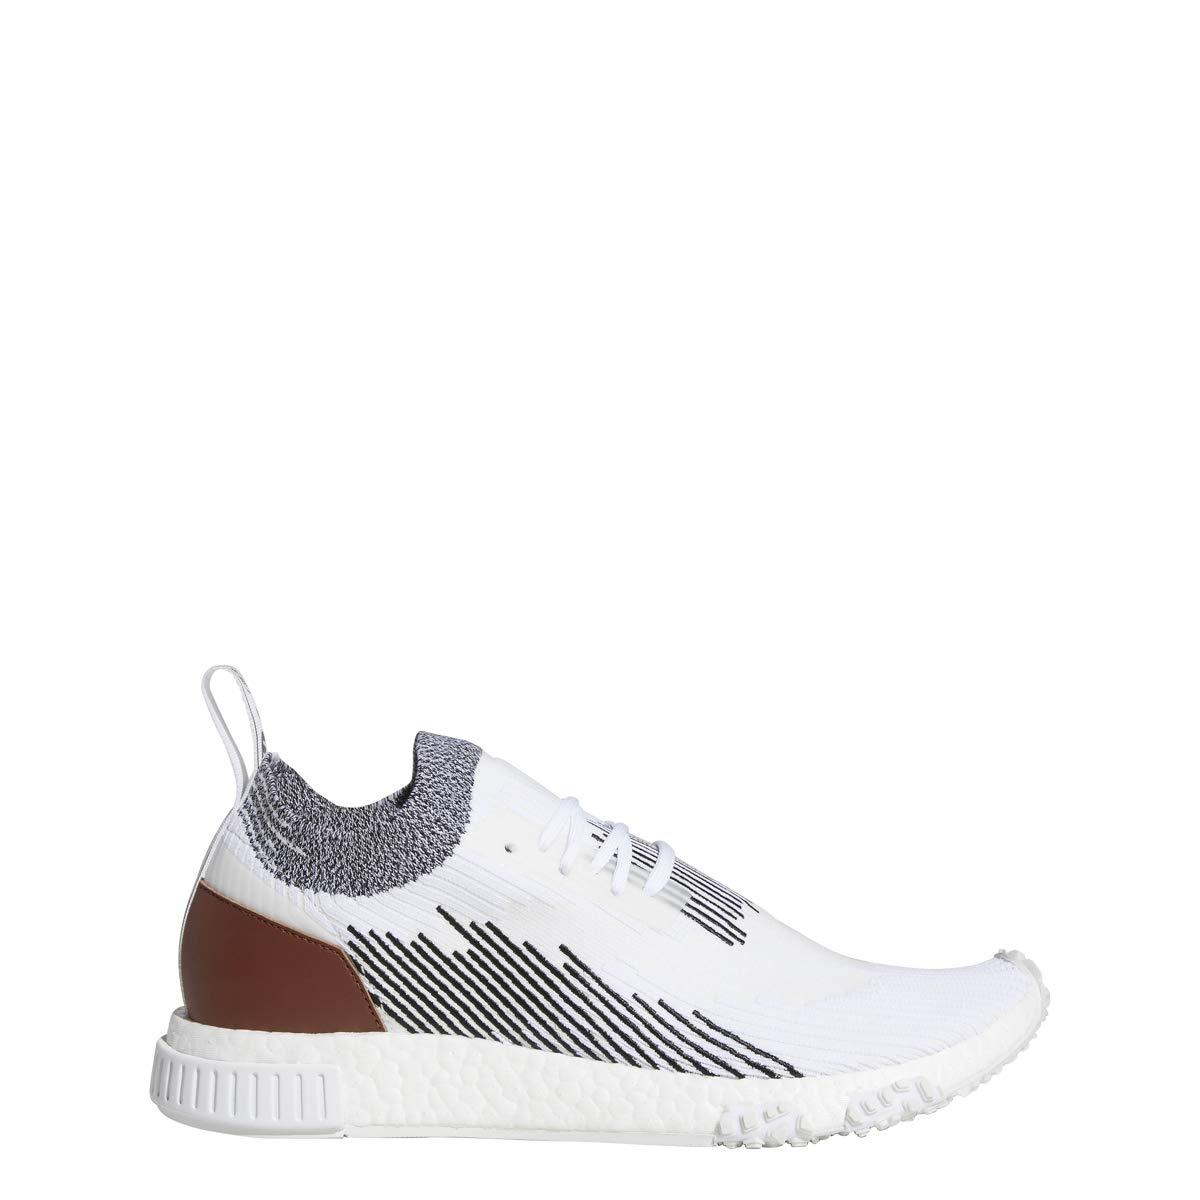 Footwear White   Core Black-redwood Adidas Mens NMD_Racer White Black Redwood - AC8233